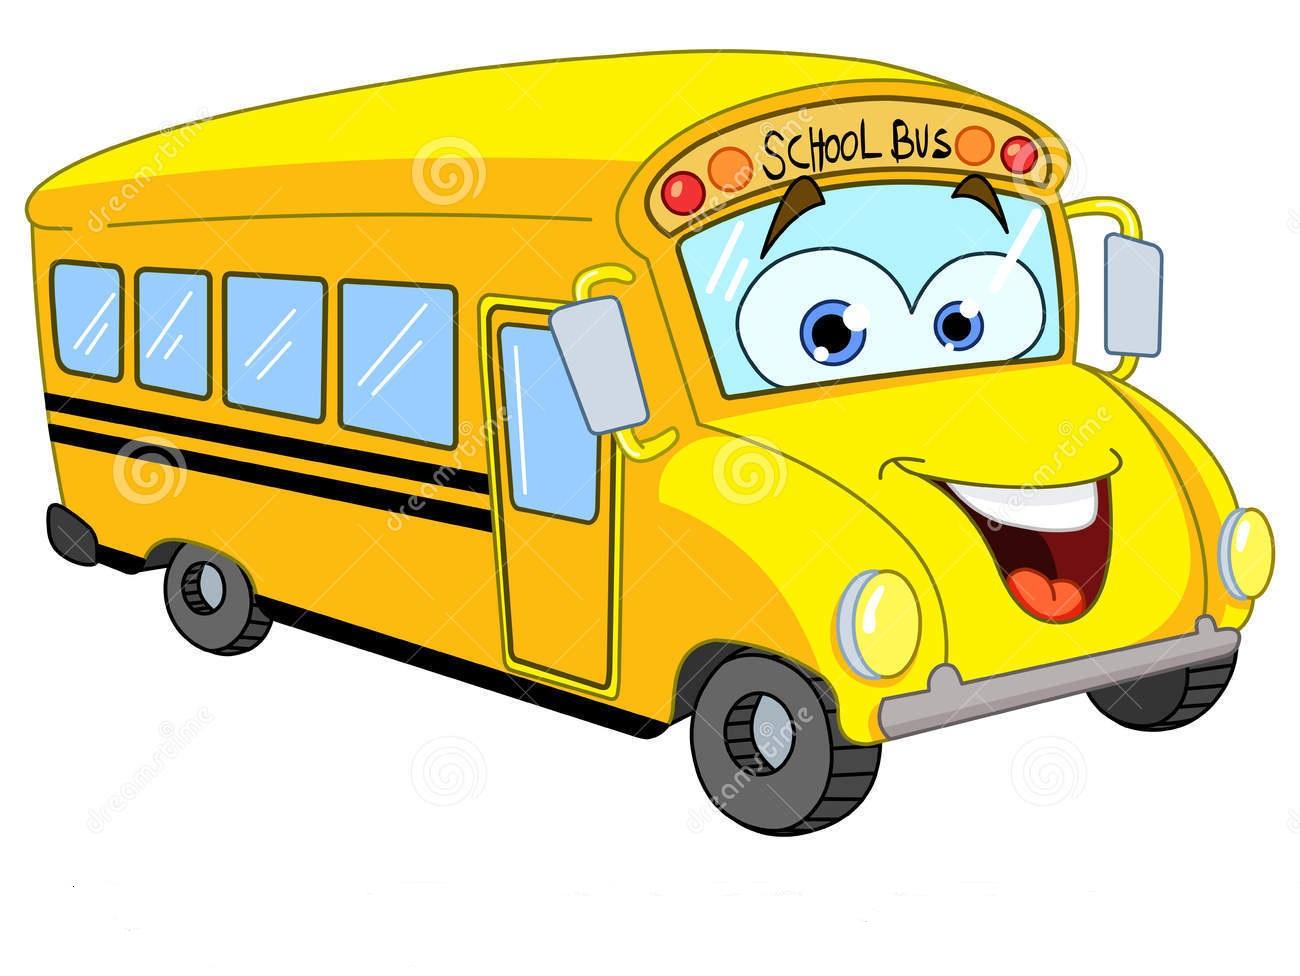 http://www.dreamstime.com/stock-images-cartoon-school-bus-image20777294